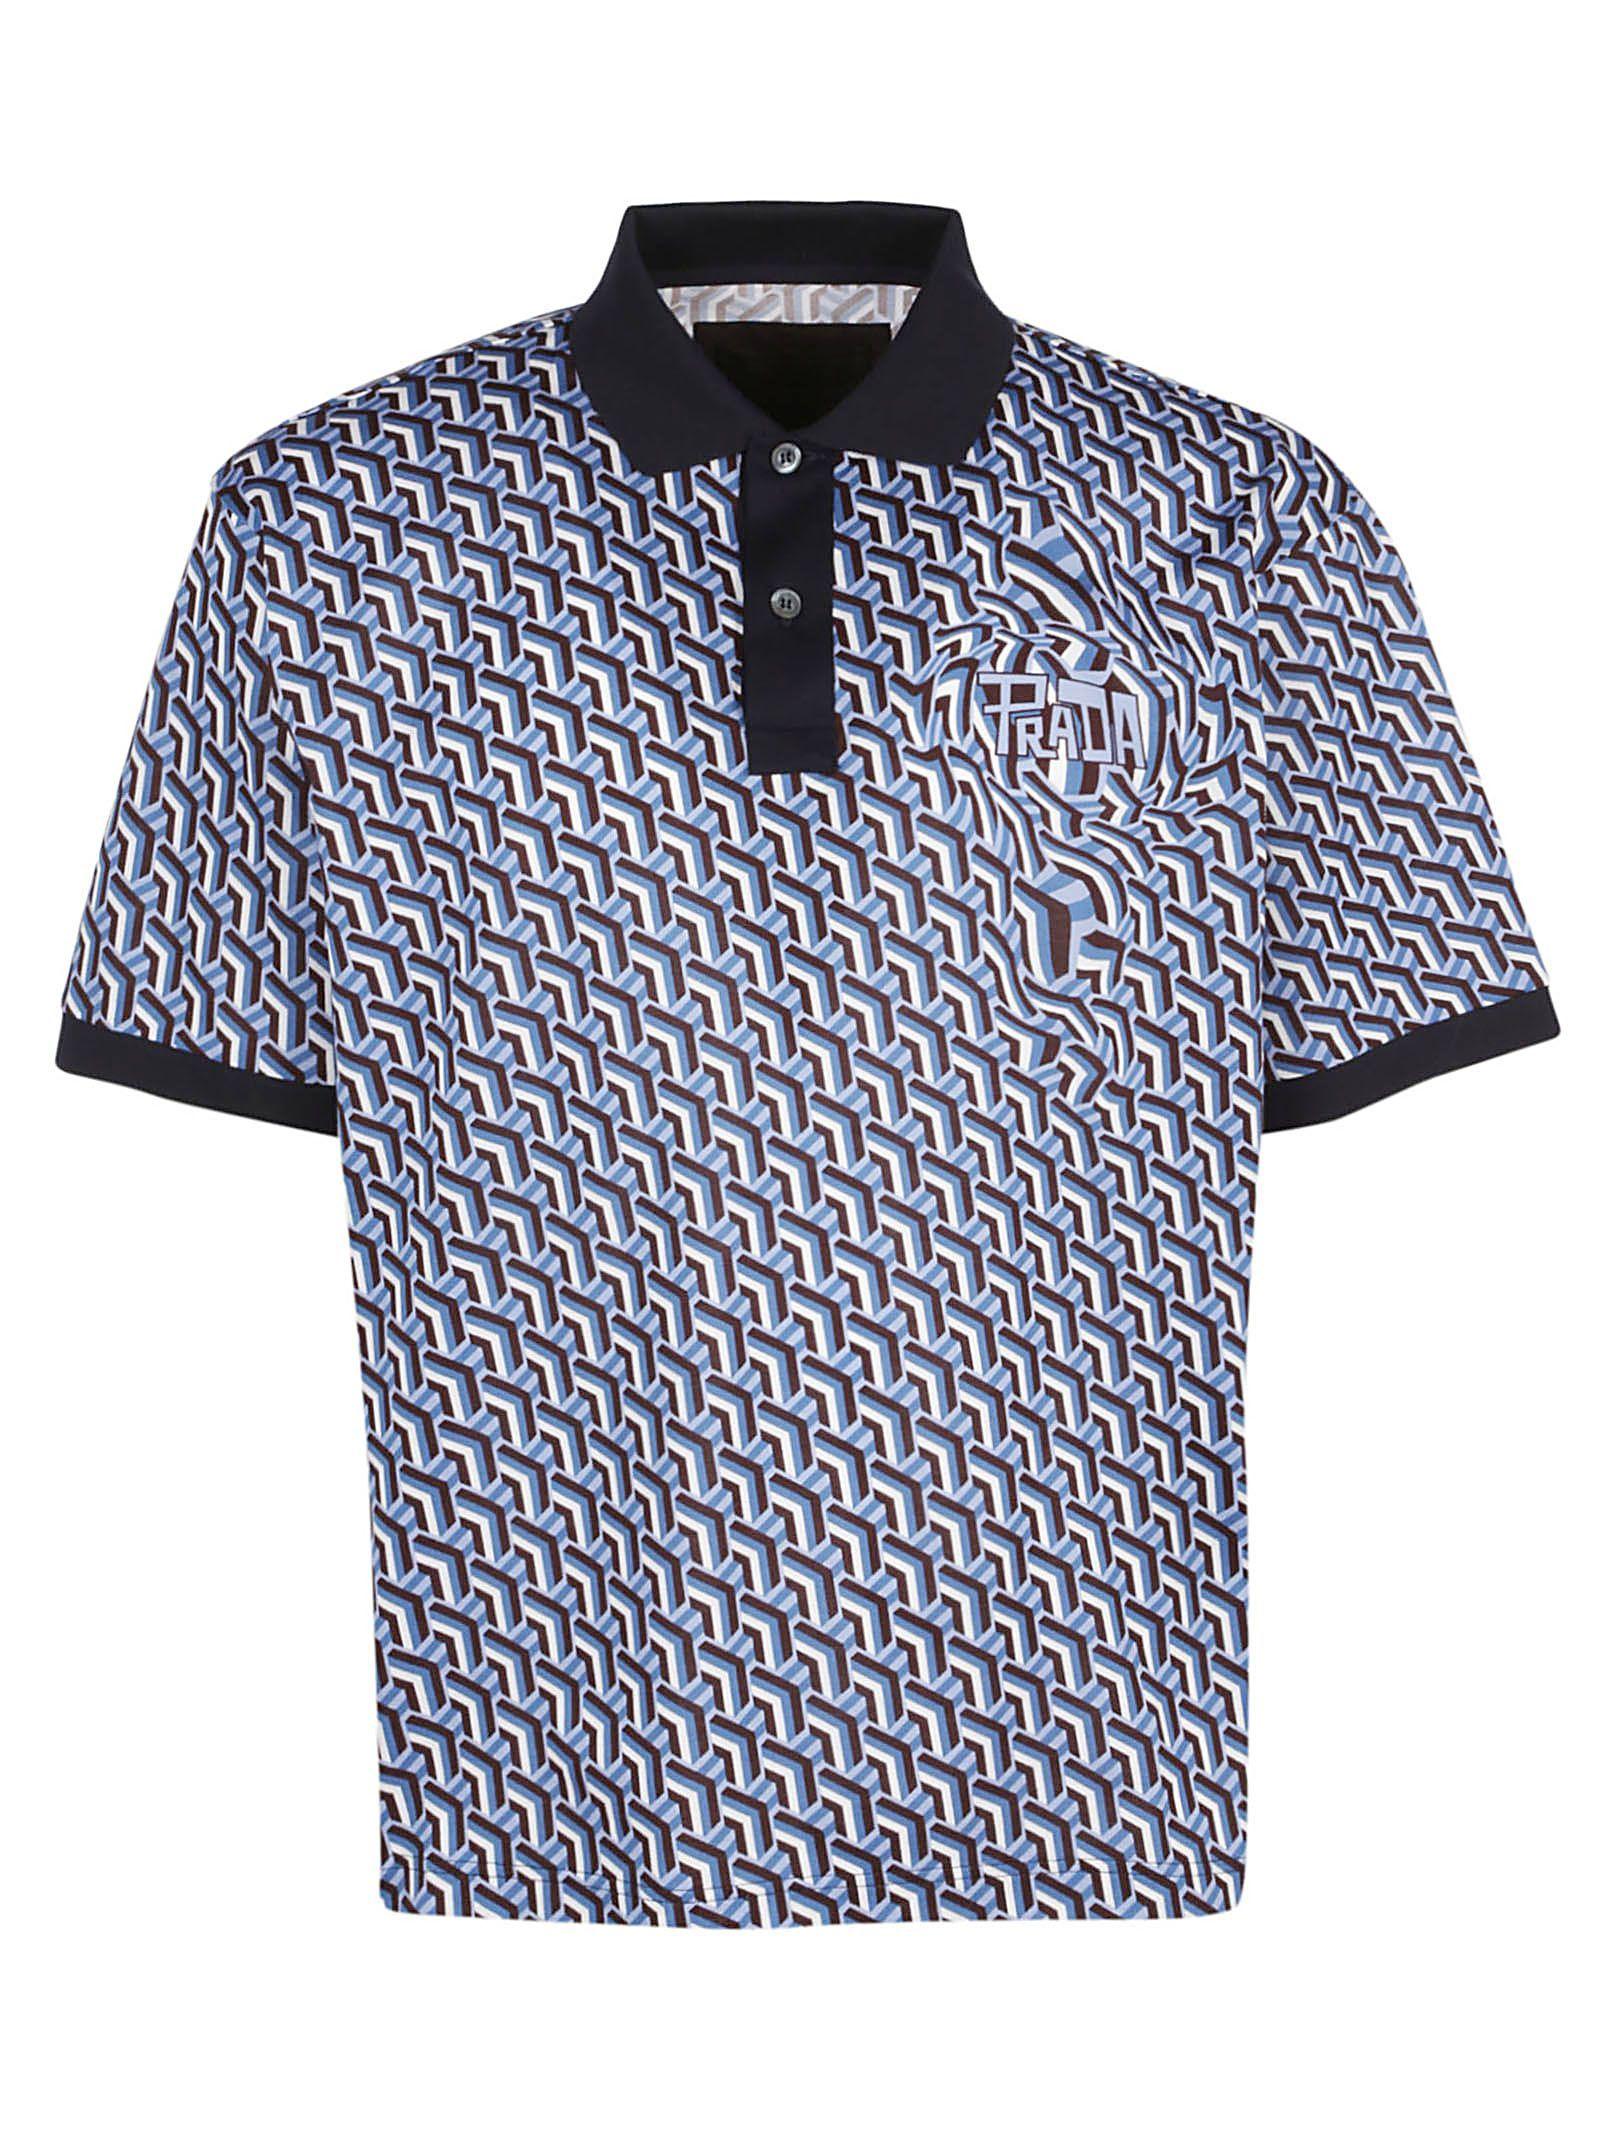 559b9bfc PRADA POLO T-SHIRT. #prada #cloth | Prada in 2019 | Polo t shirts ...